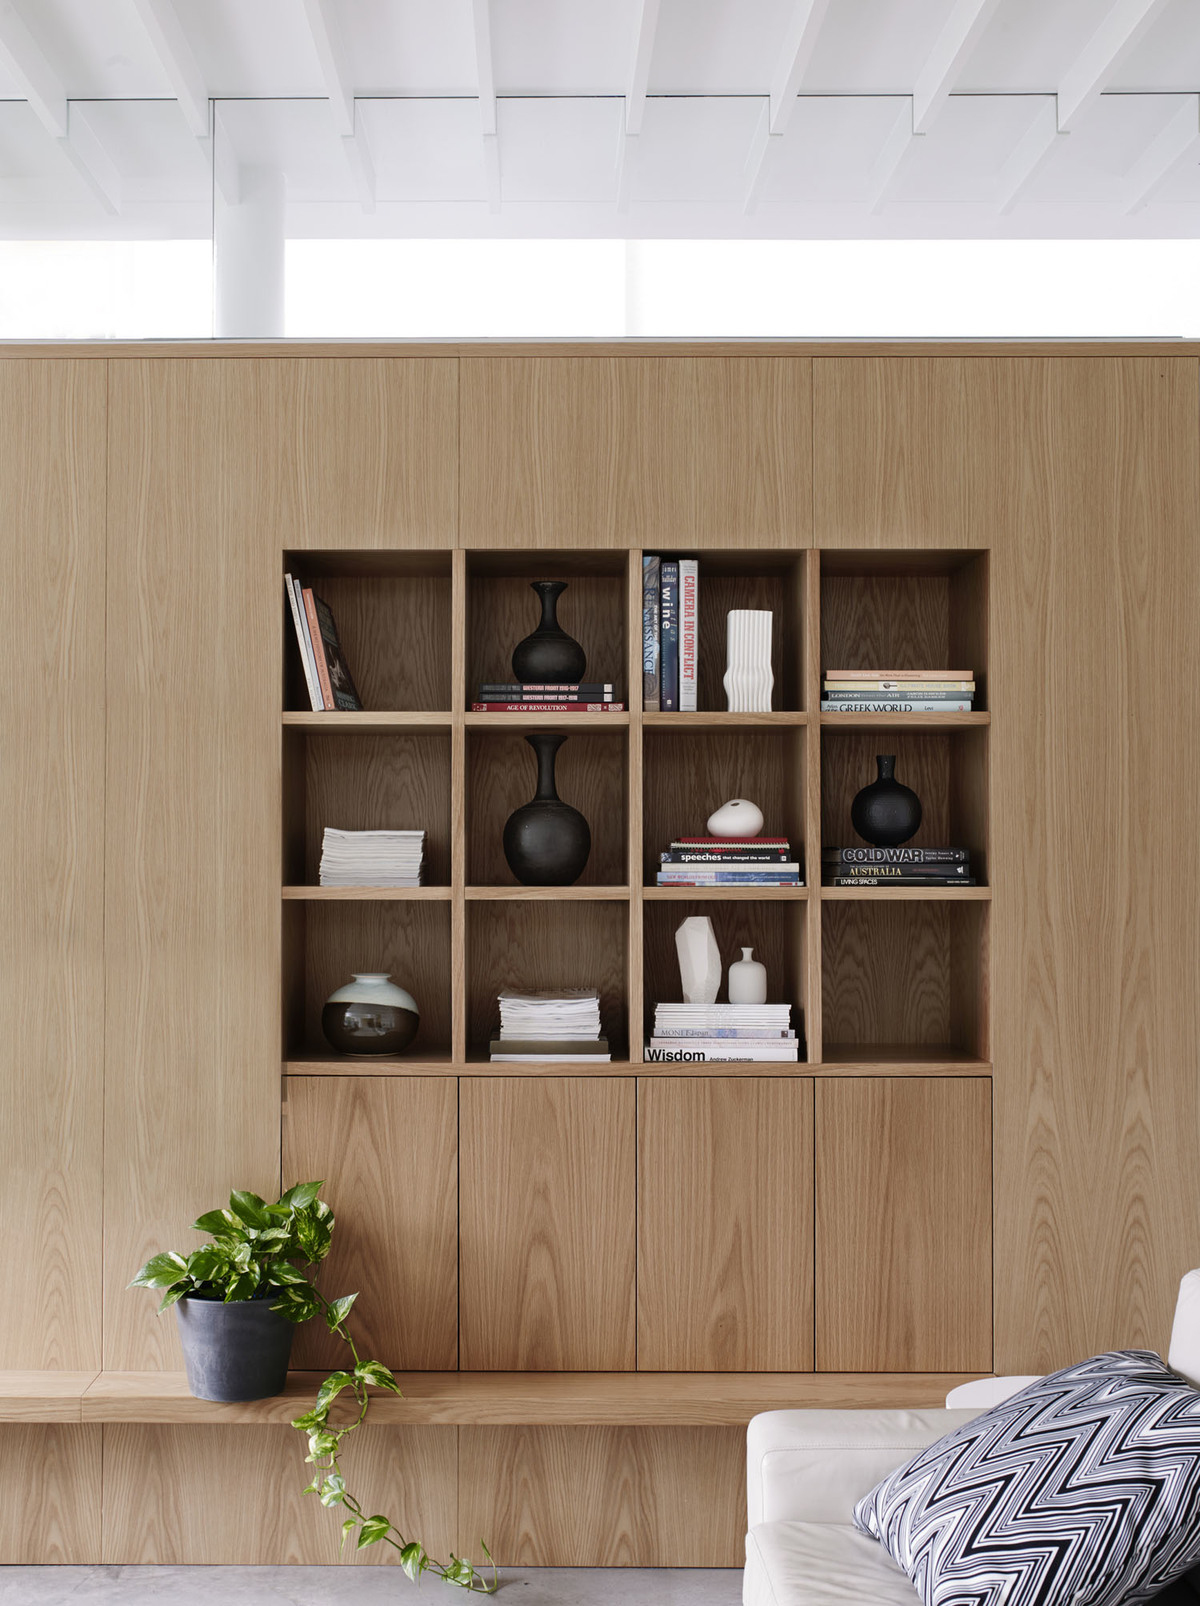 Coogee House - Australian Timber Storage Design - Madeleine Blanchfield Architects - Interior Archive